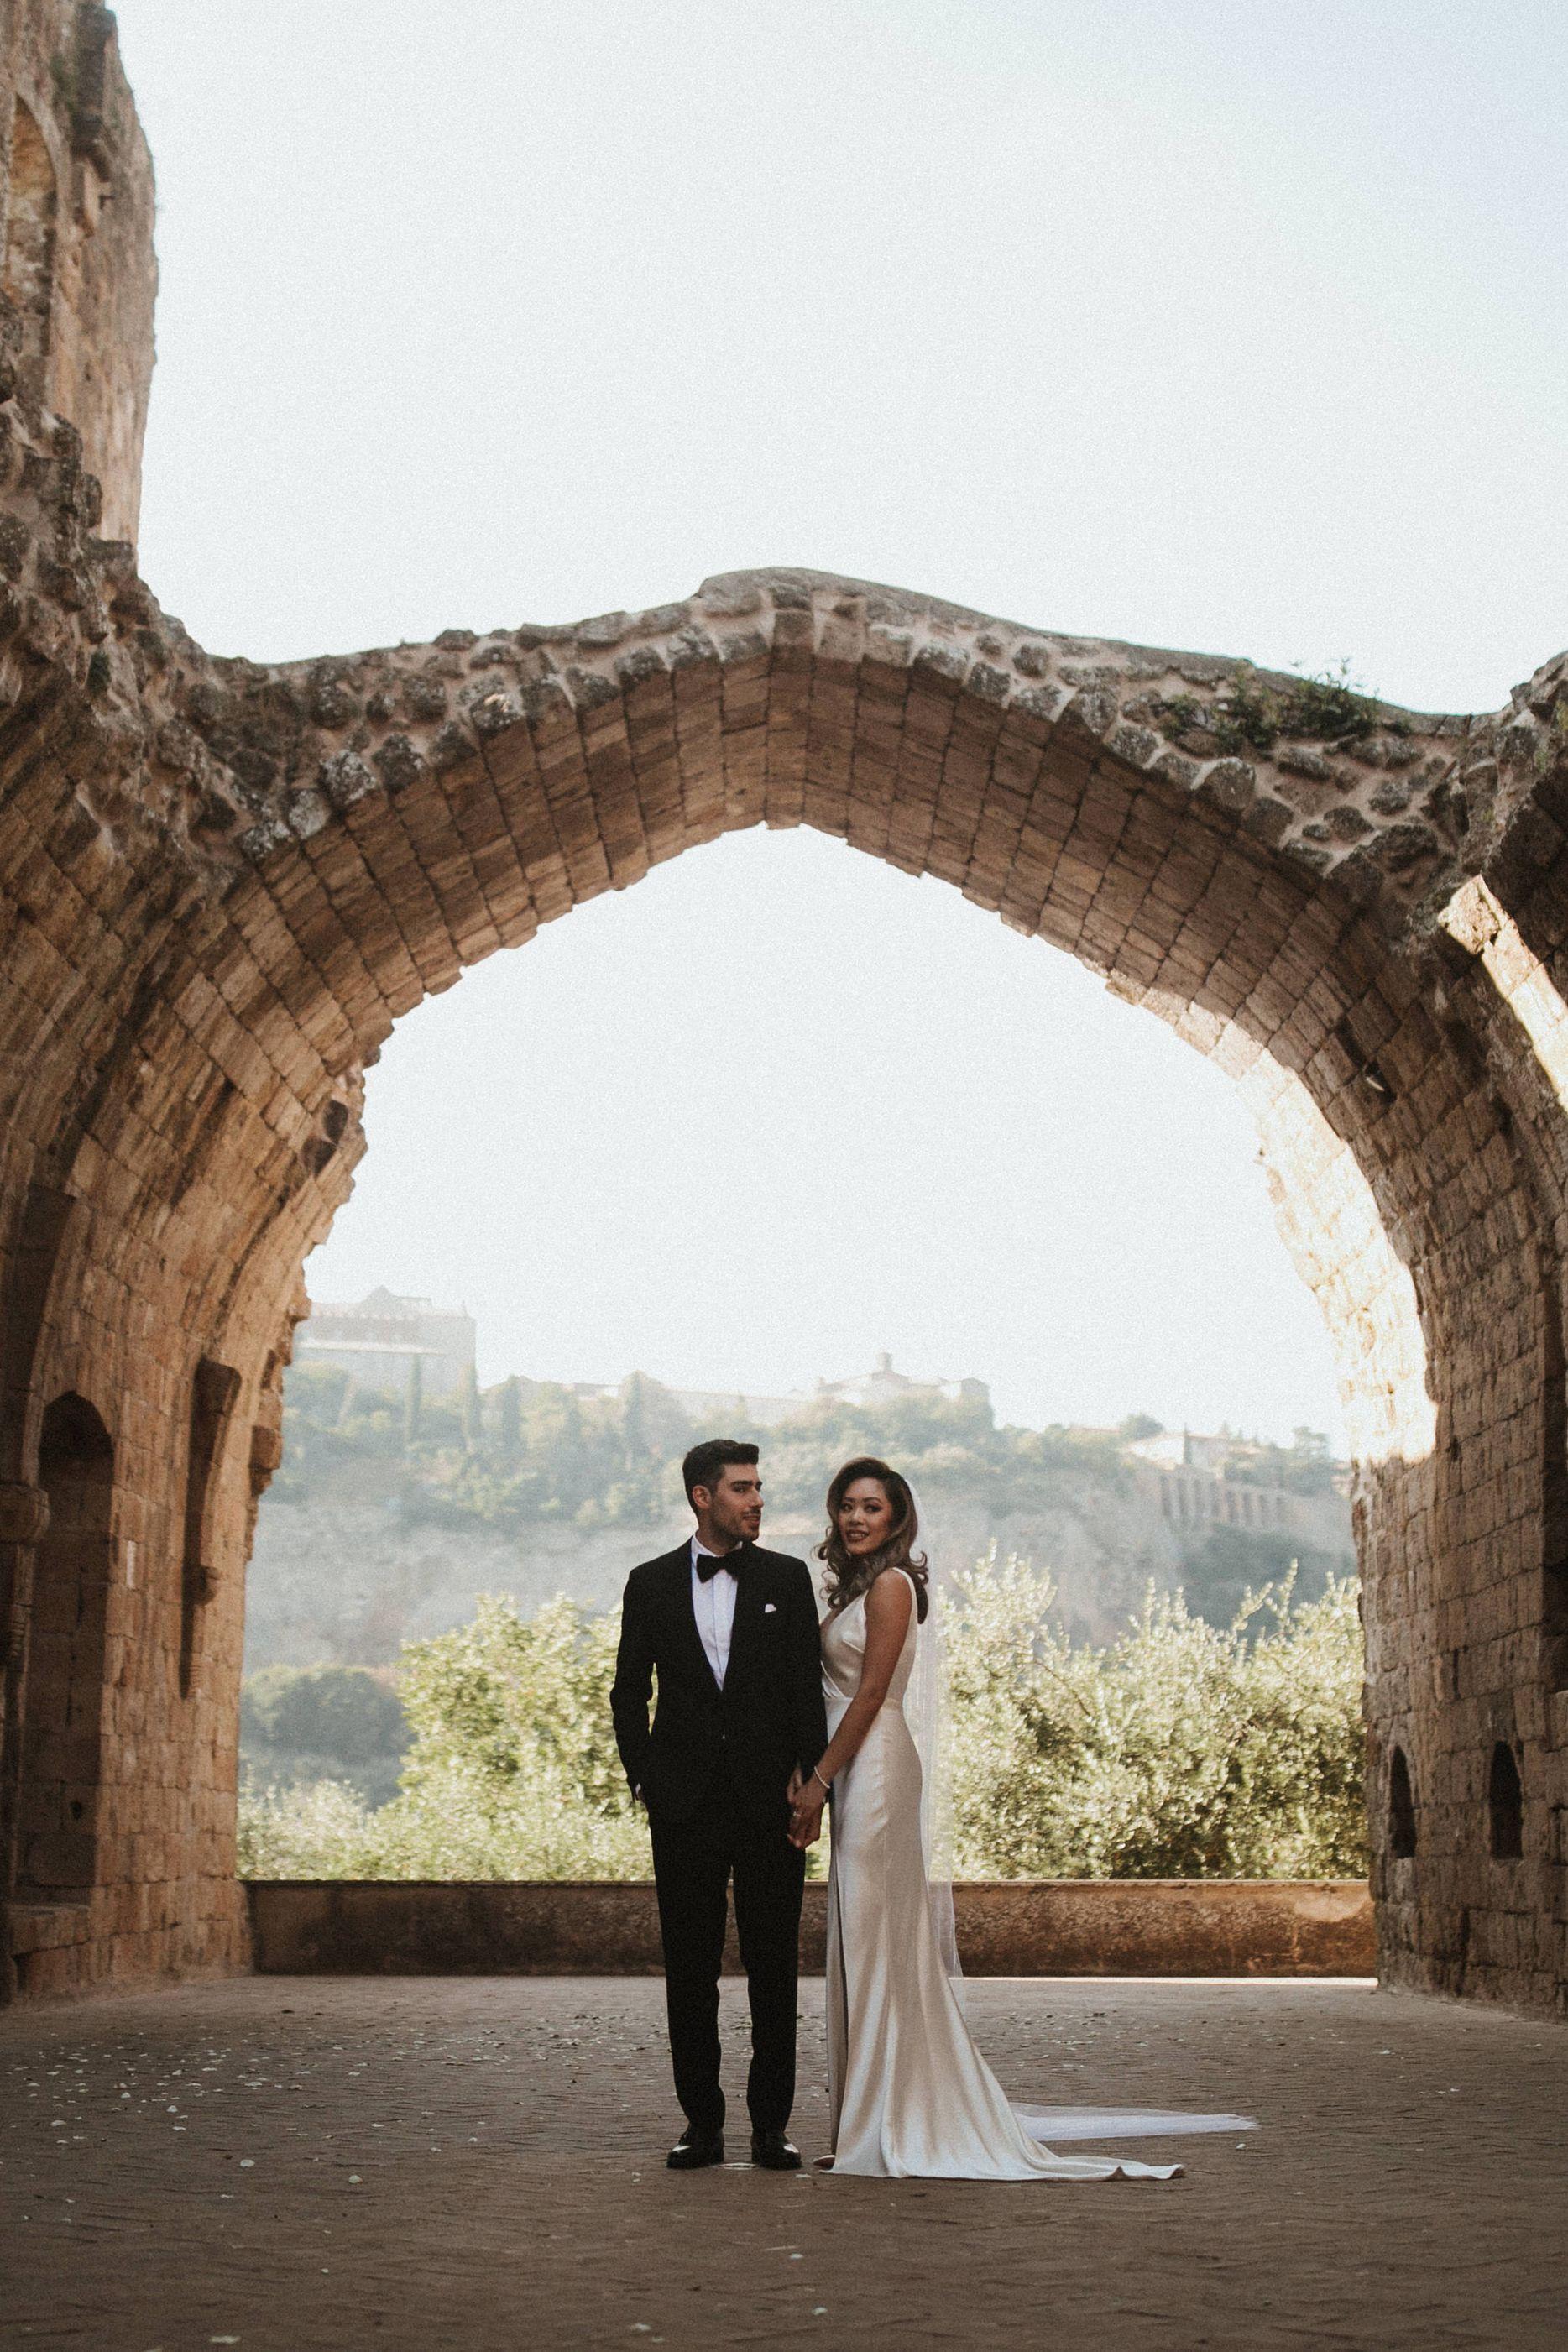 wiskow white italy wedding 323